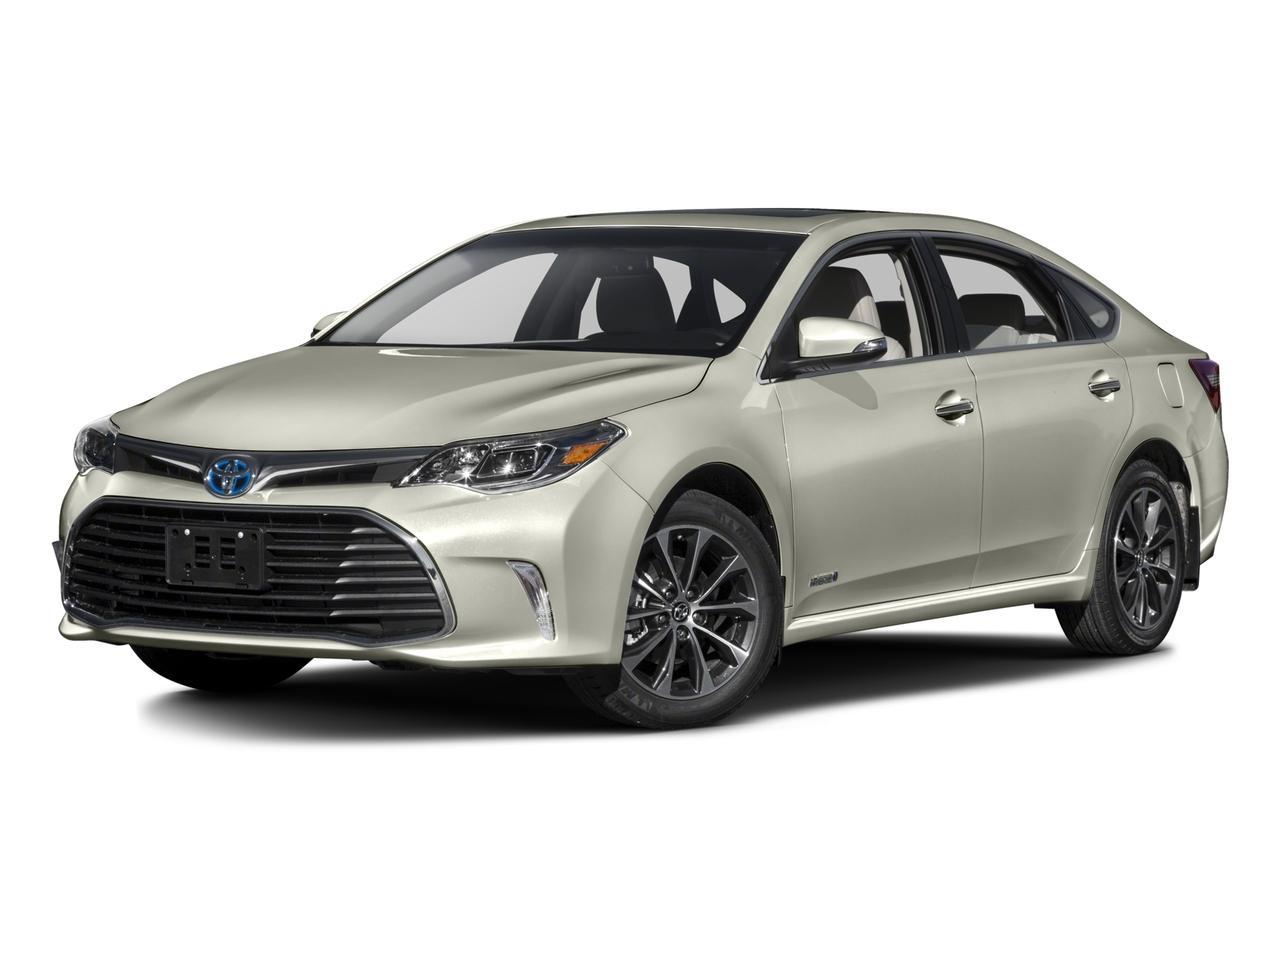 2016 Toyota Avalon Hybrid Vehicle Photo in San Leandro, CA 94577